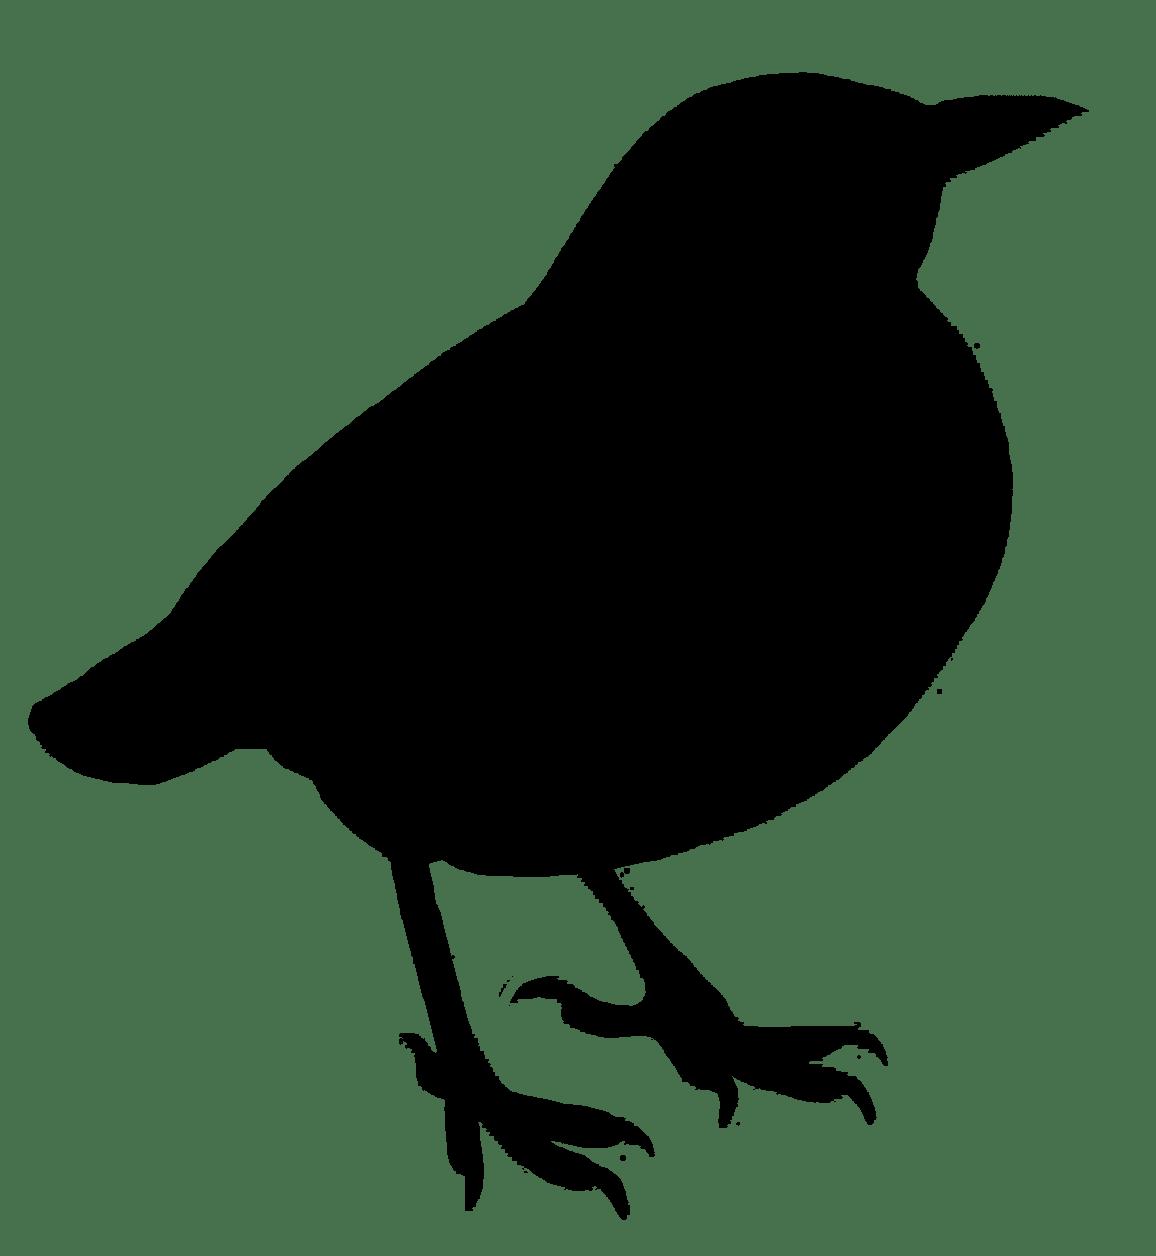 Silhouette clipart transparent background jpg library library Bird Silhouette Clipart transparent PNG - StickPNG jpg library library